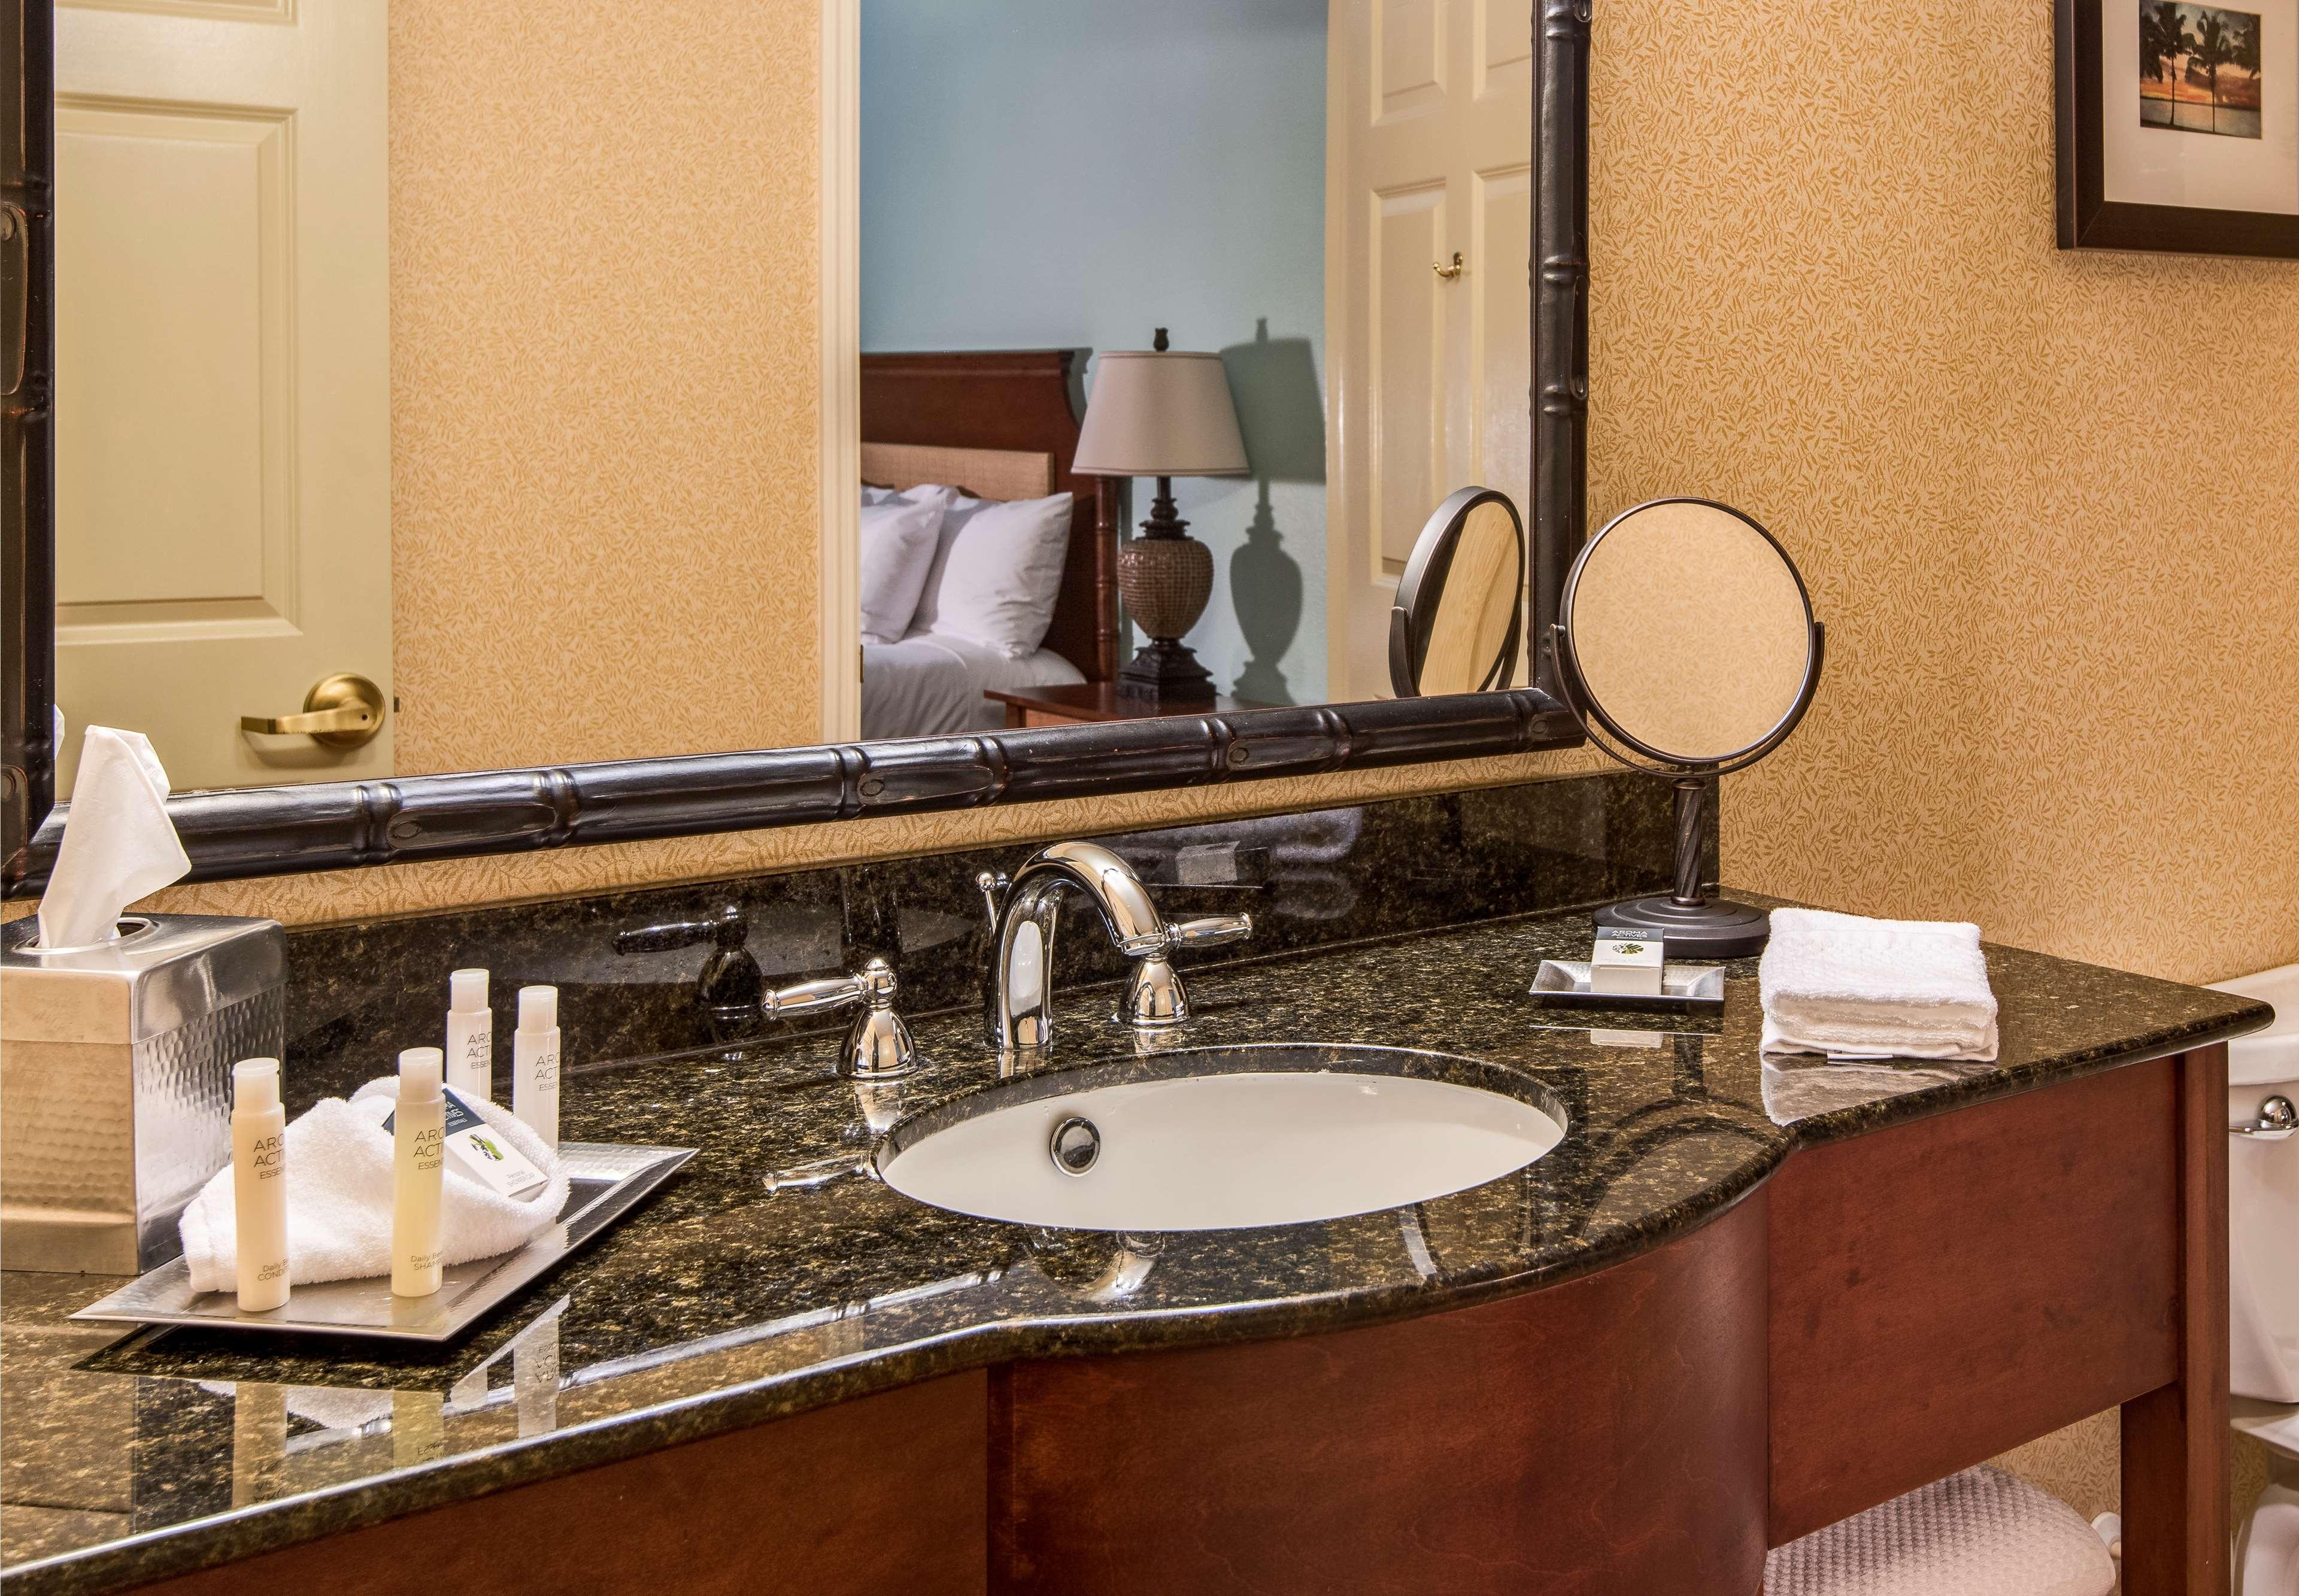 DoubleTree Suites by Hilton Hotel Naples image 24